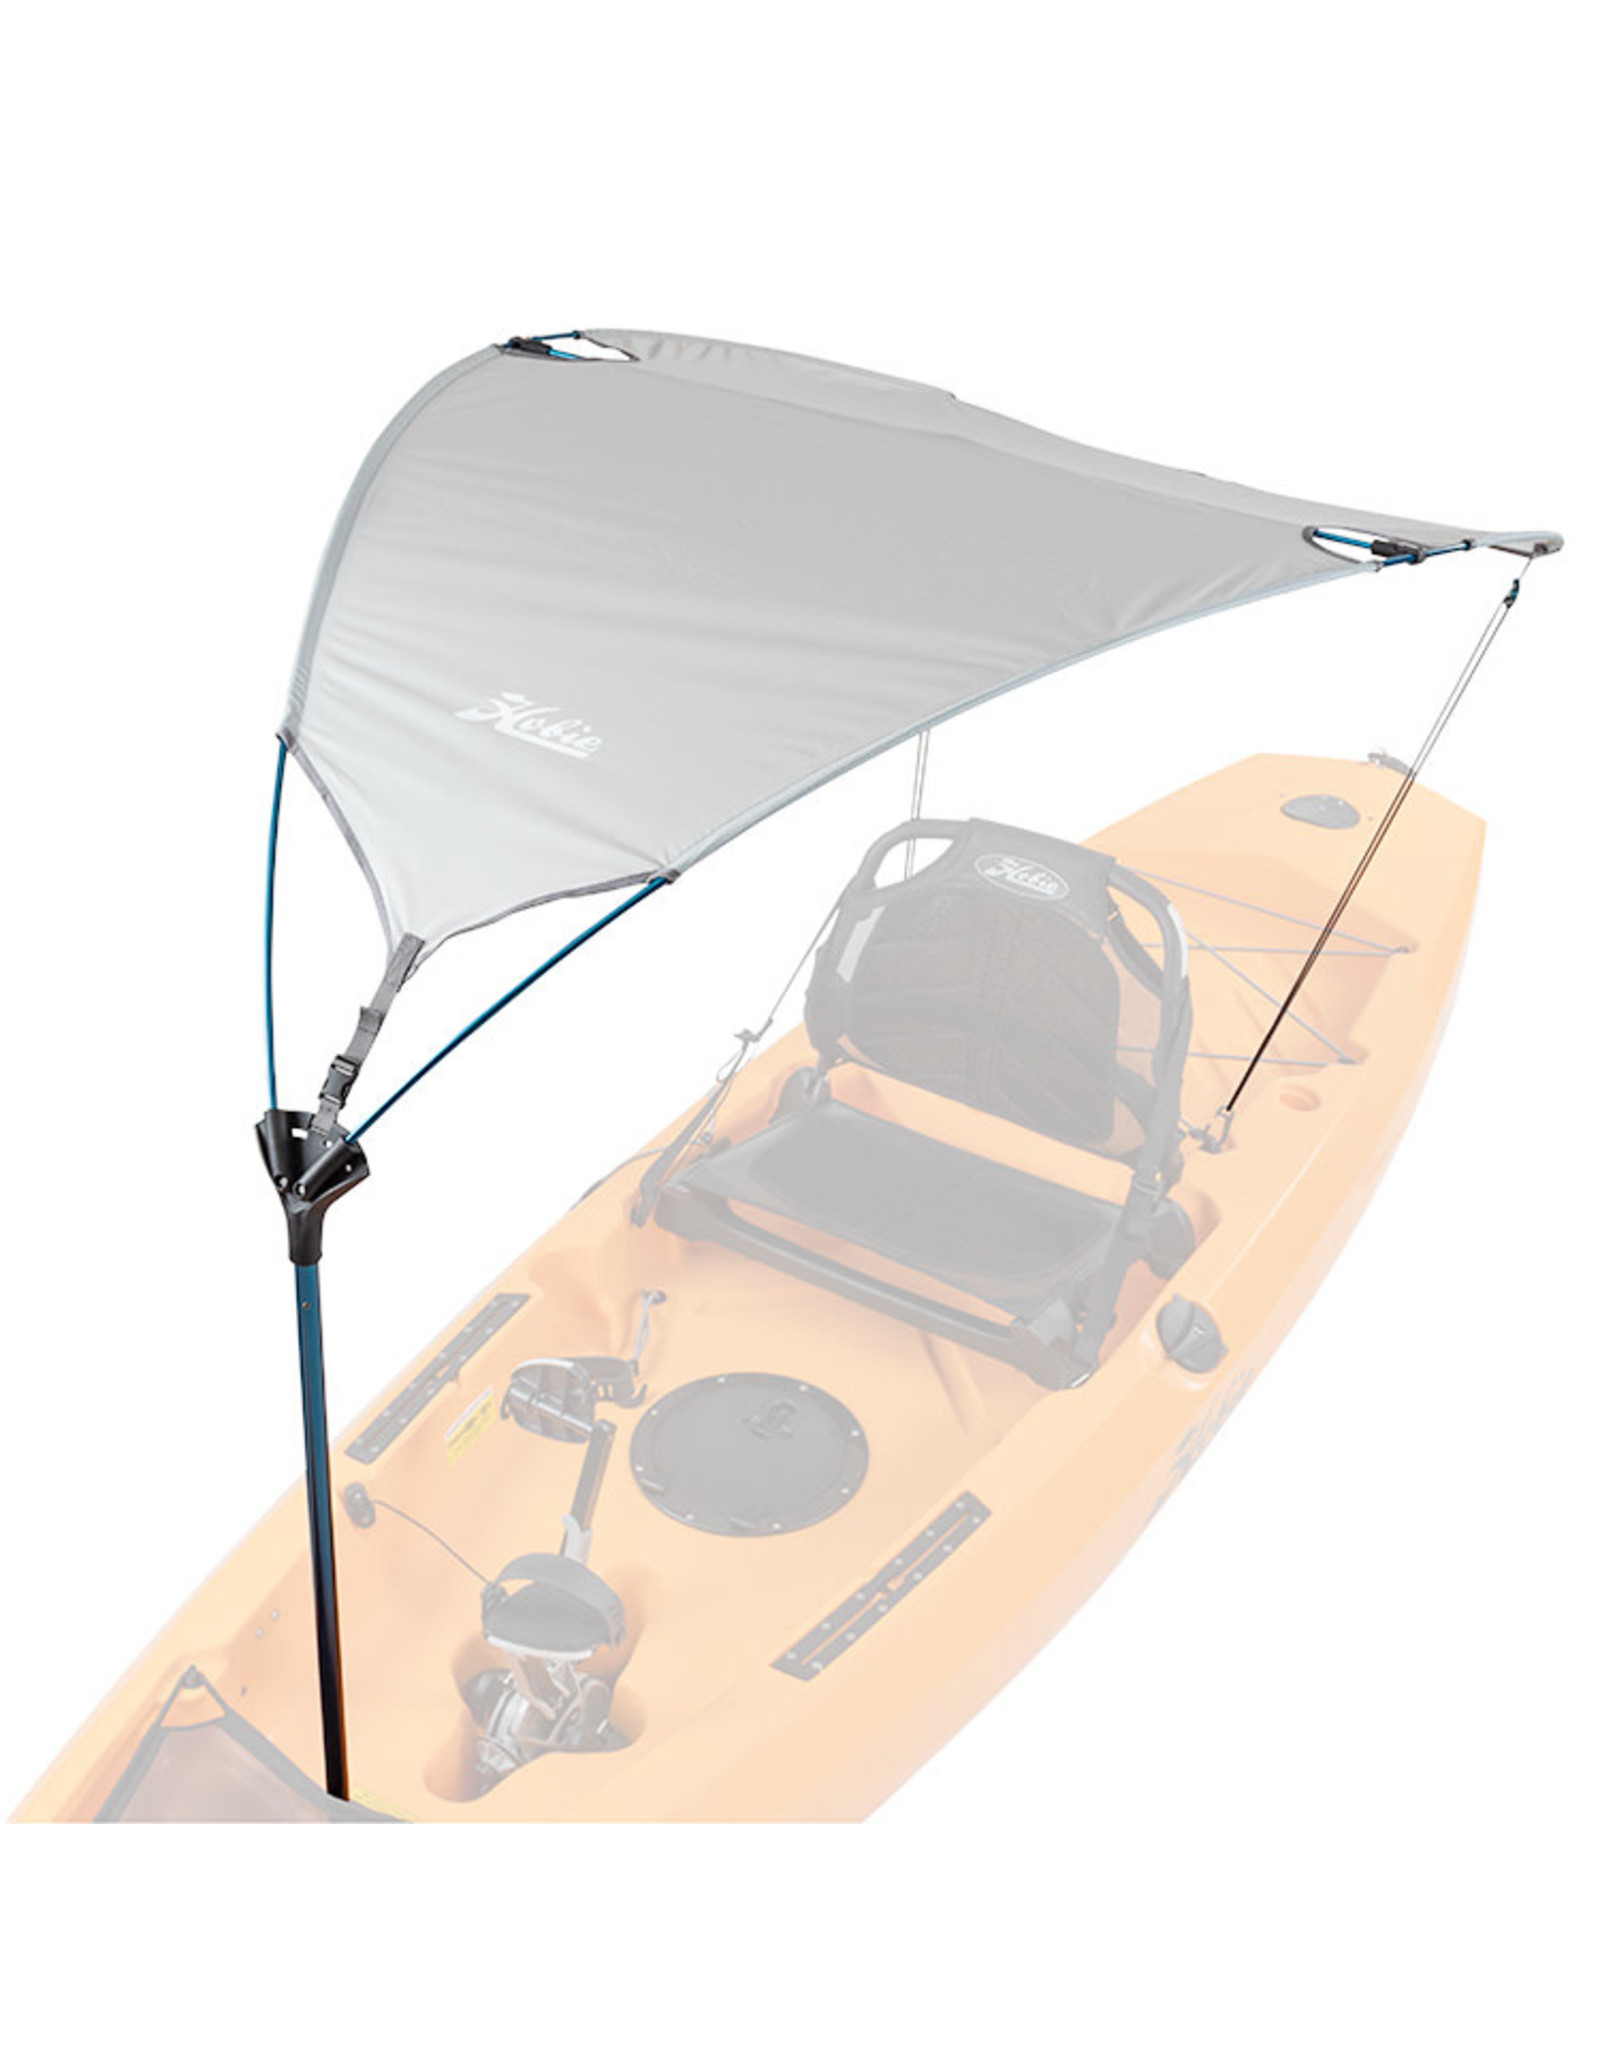 Hobie Hobie Acc. Toit Bimini pour kayak